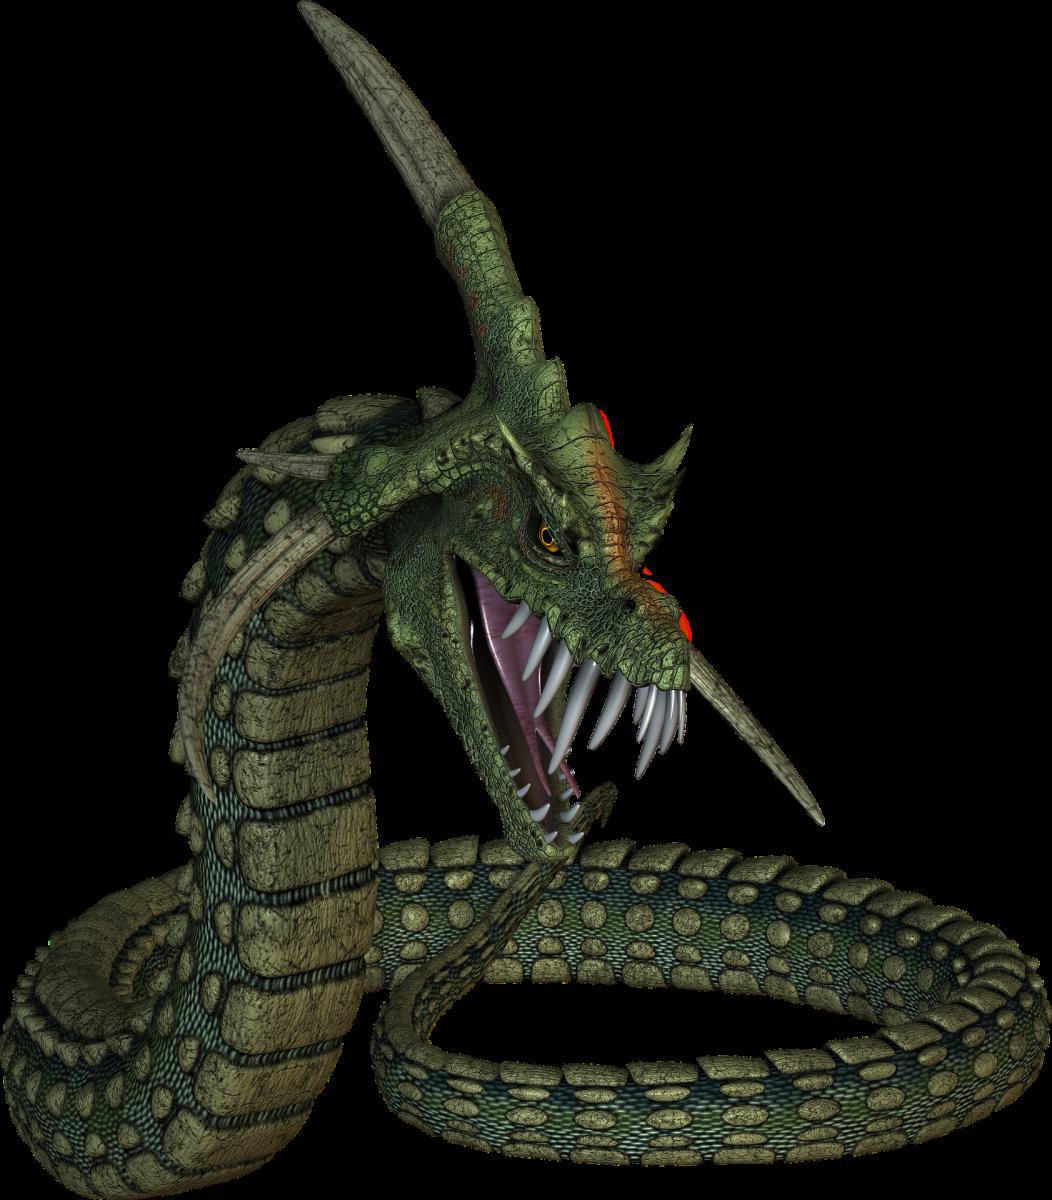 Frankie and the Snake Devil of Skuna River Bottom